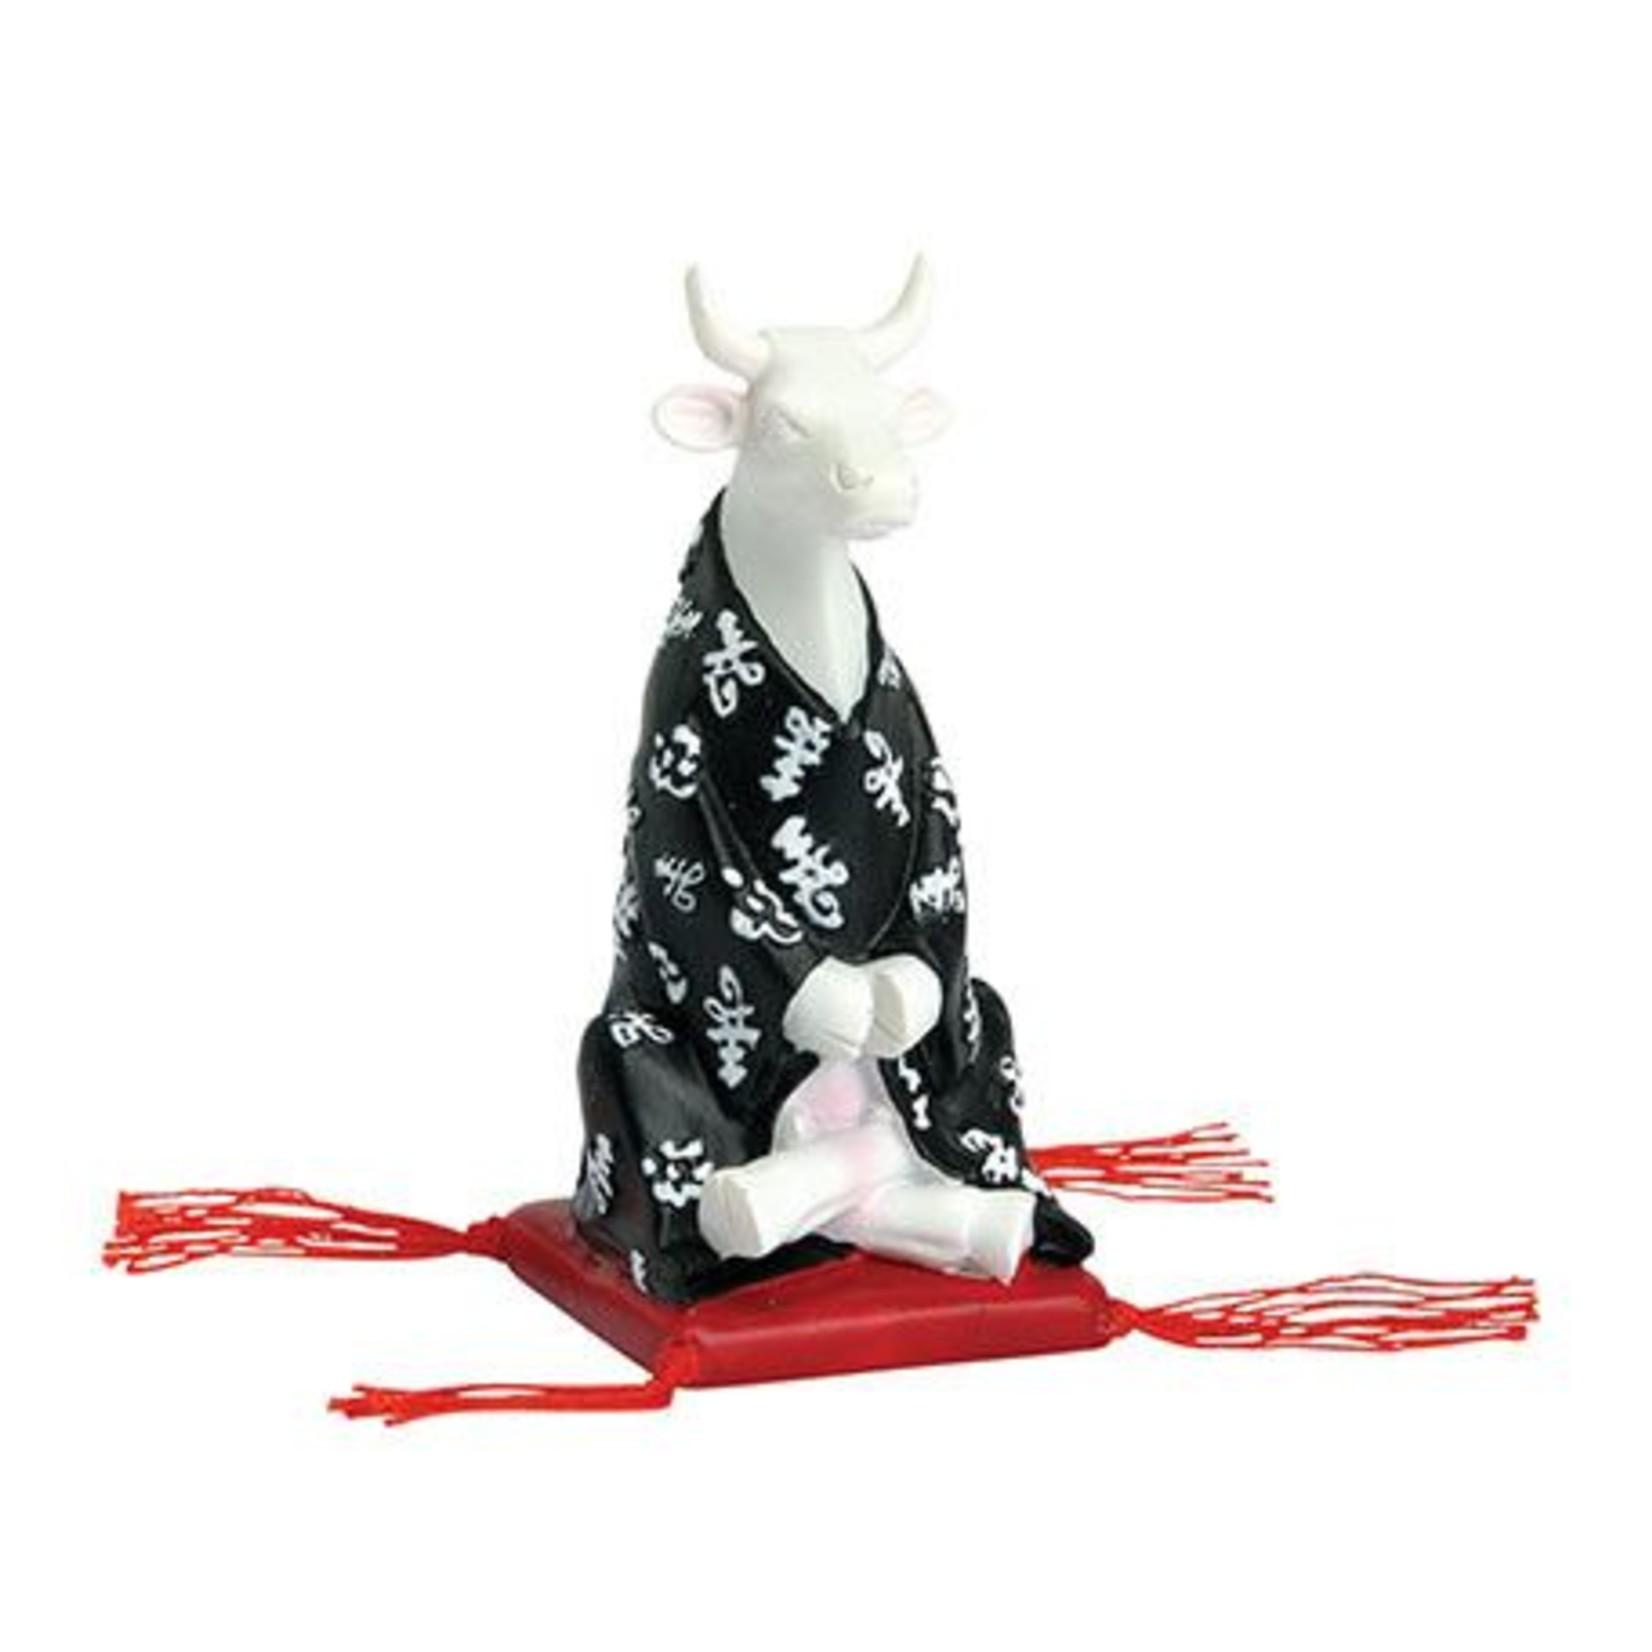 Cowparade Cowparade Small Meditating Cow